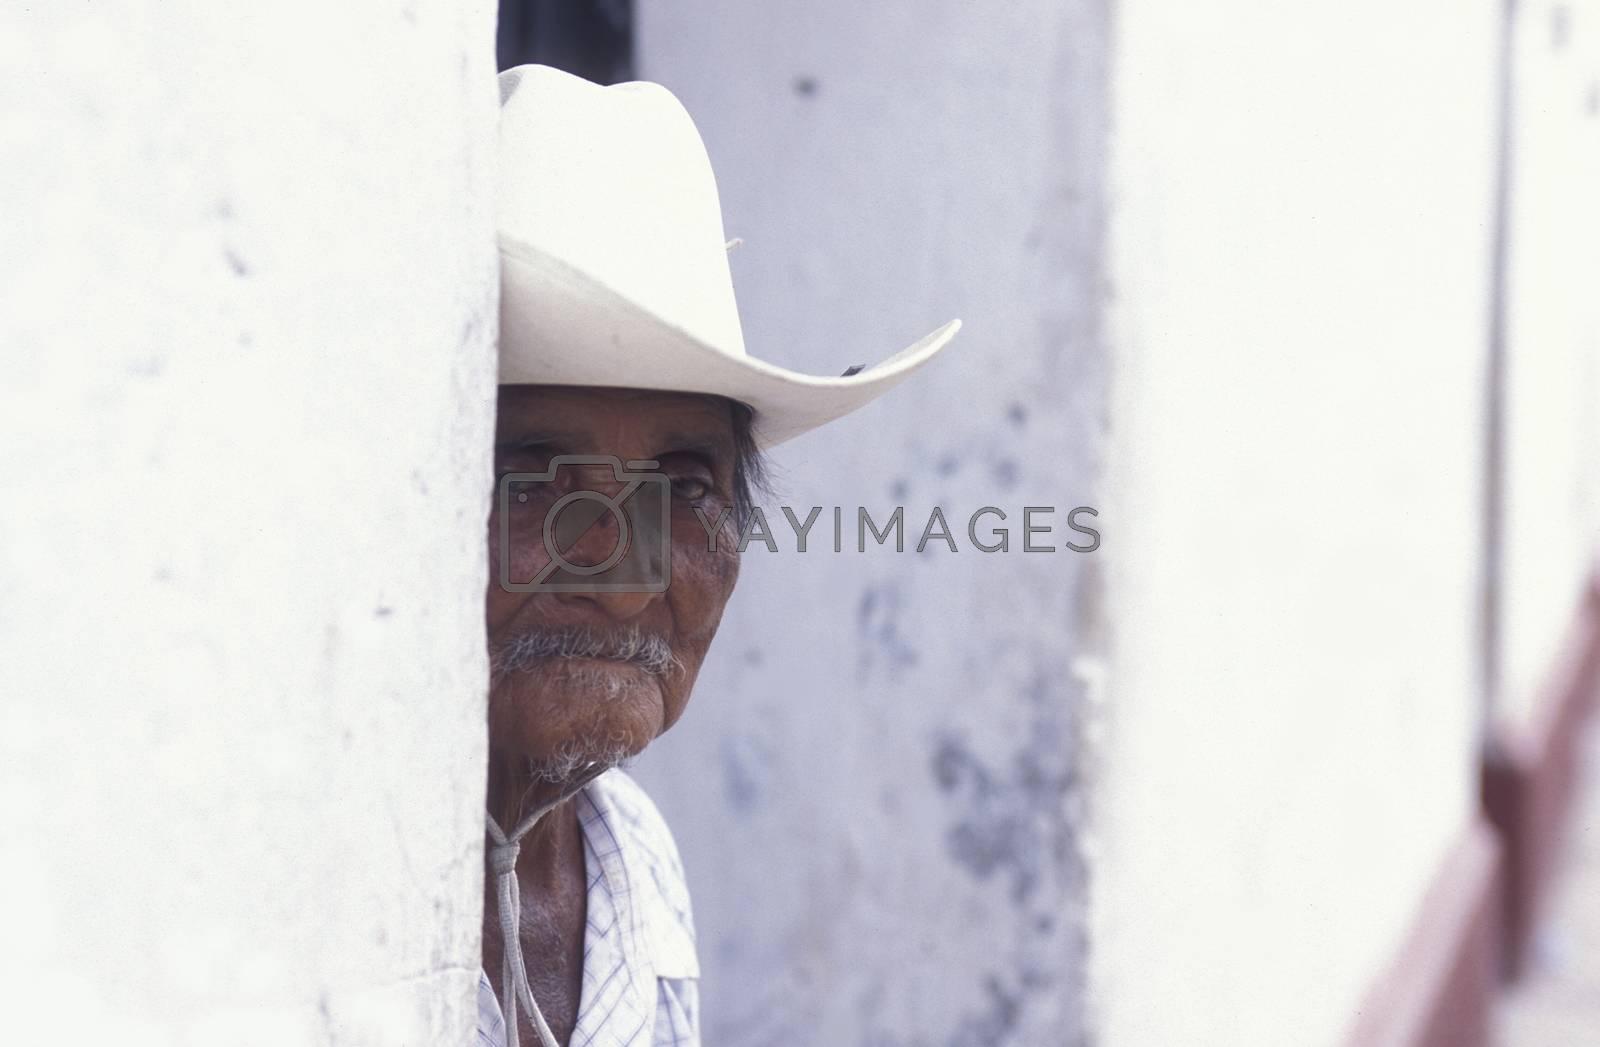 LATIN AMERICA HONDURAS COPAN by urf